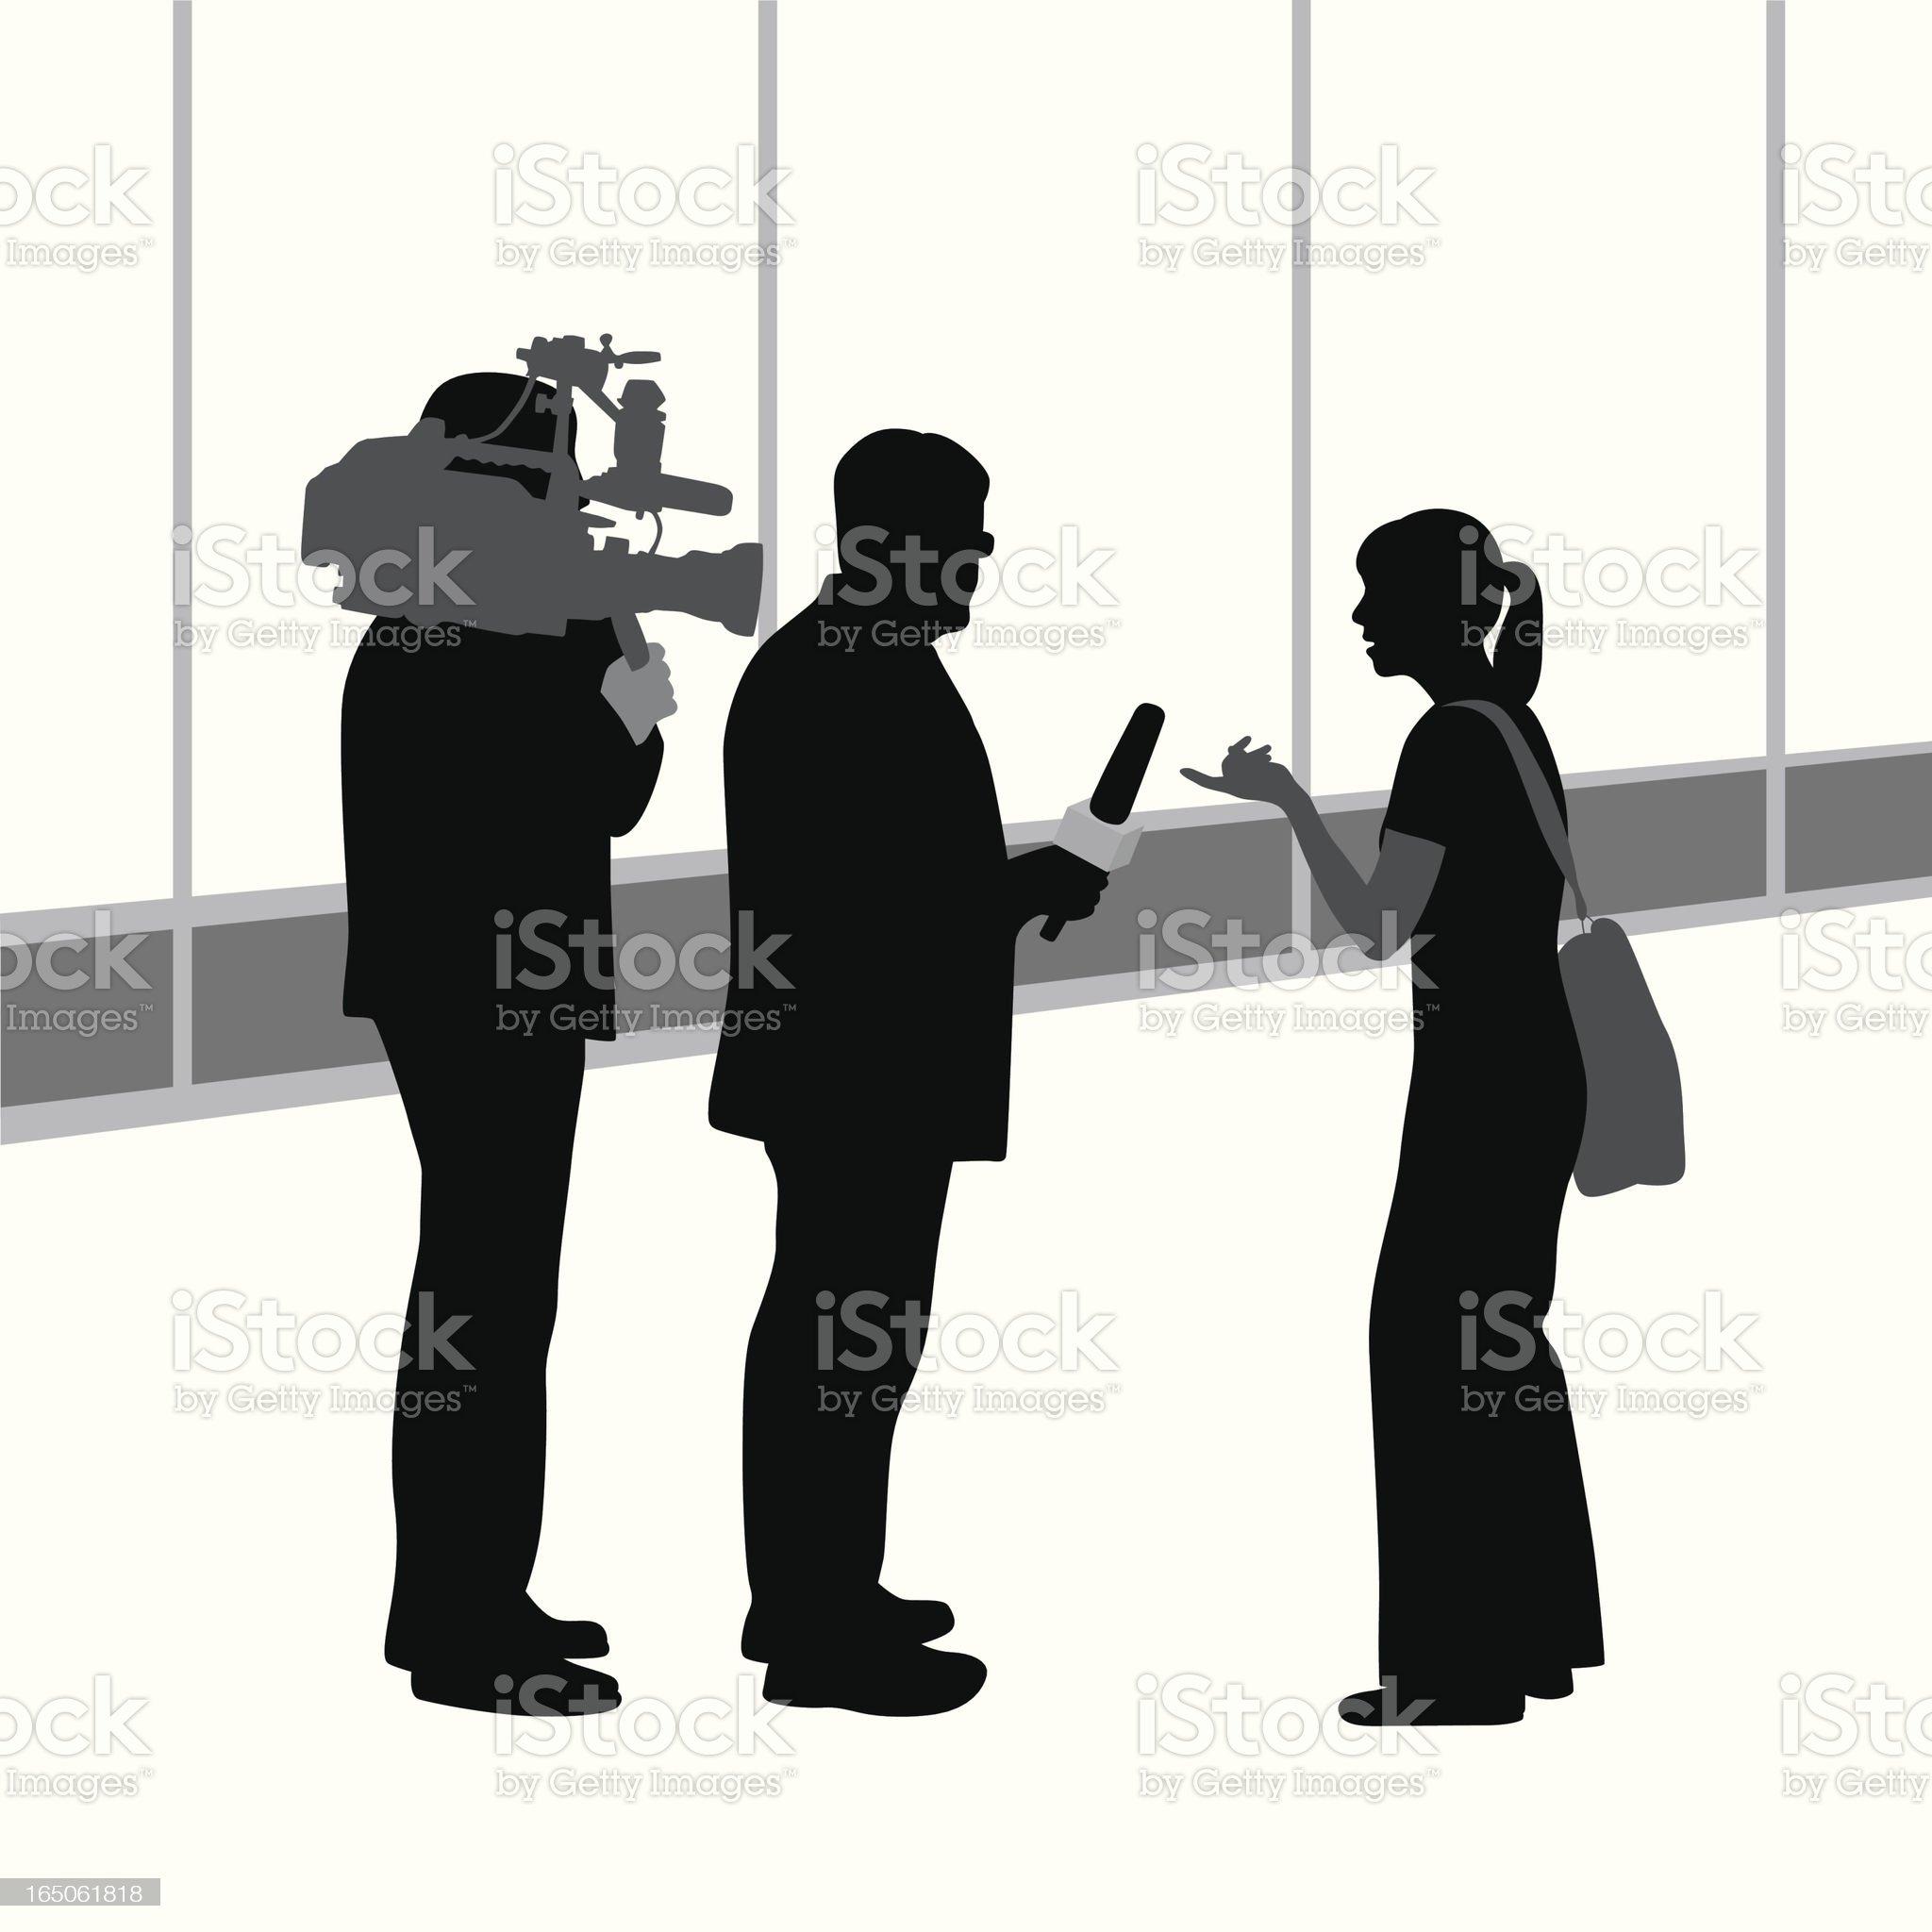 Public Opinion Vector Silhouette royalty-free stock vector art